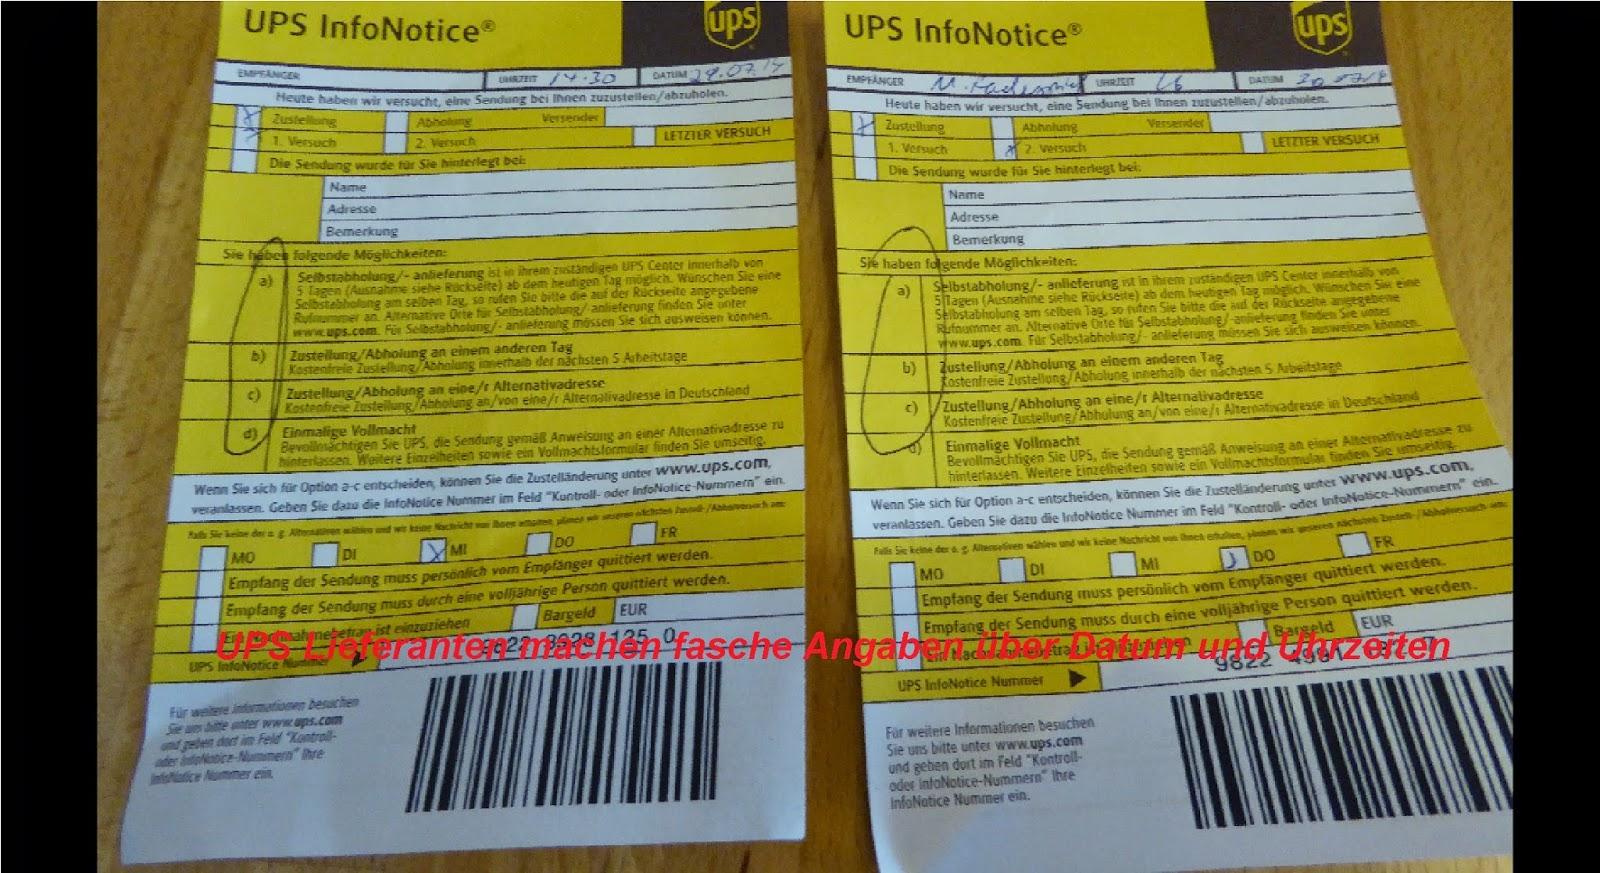 UPS Versand UPS Versand ist mangelhaft